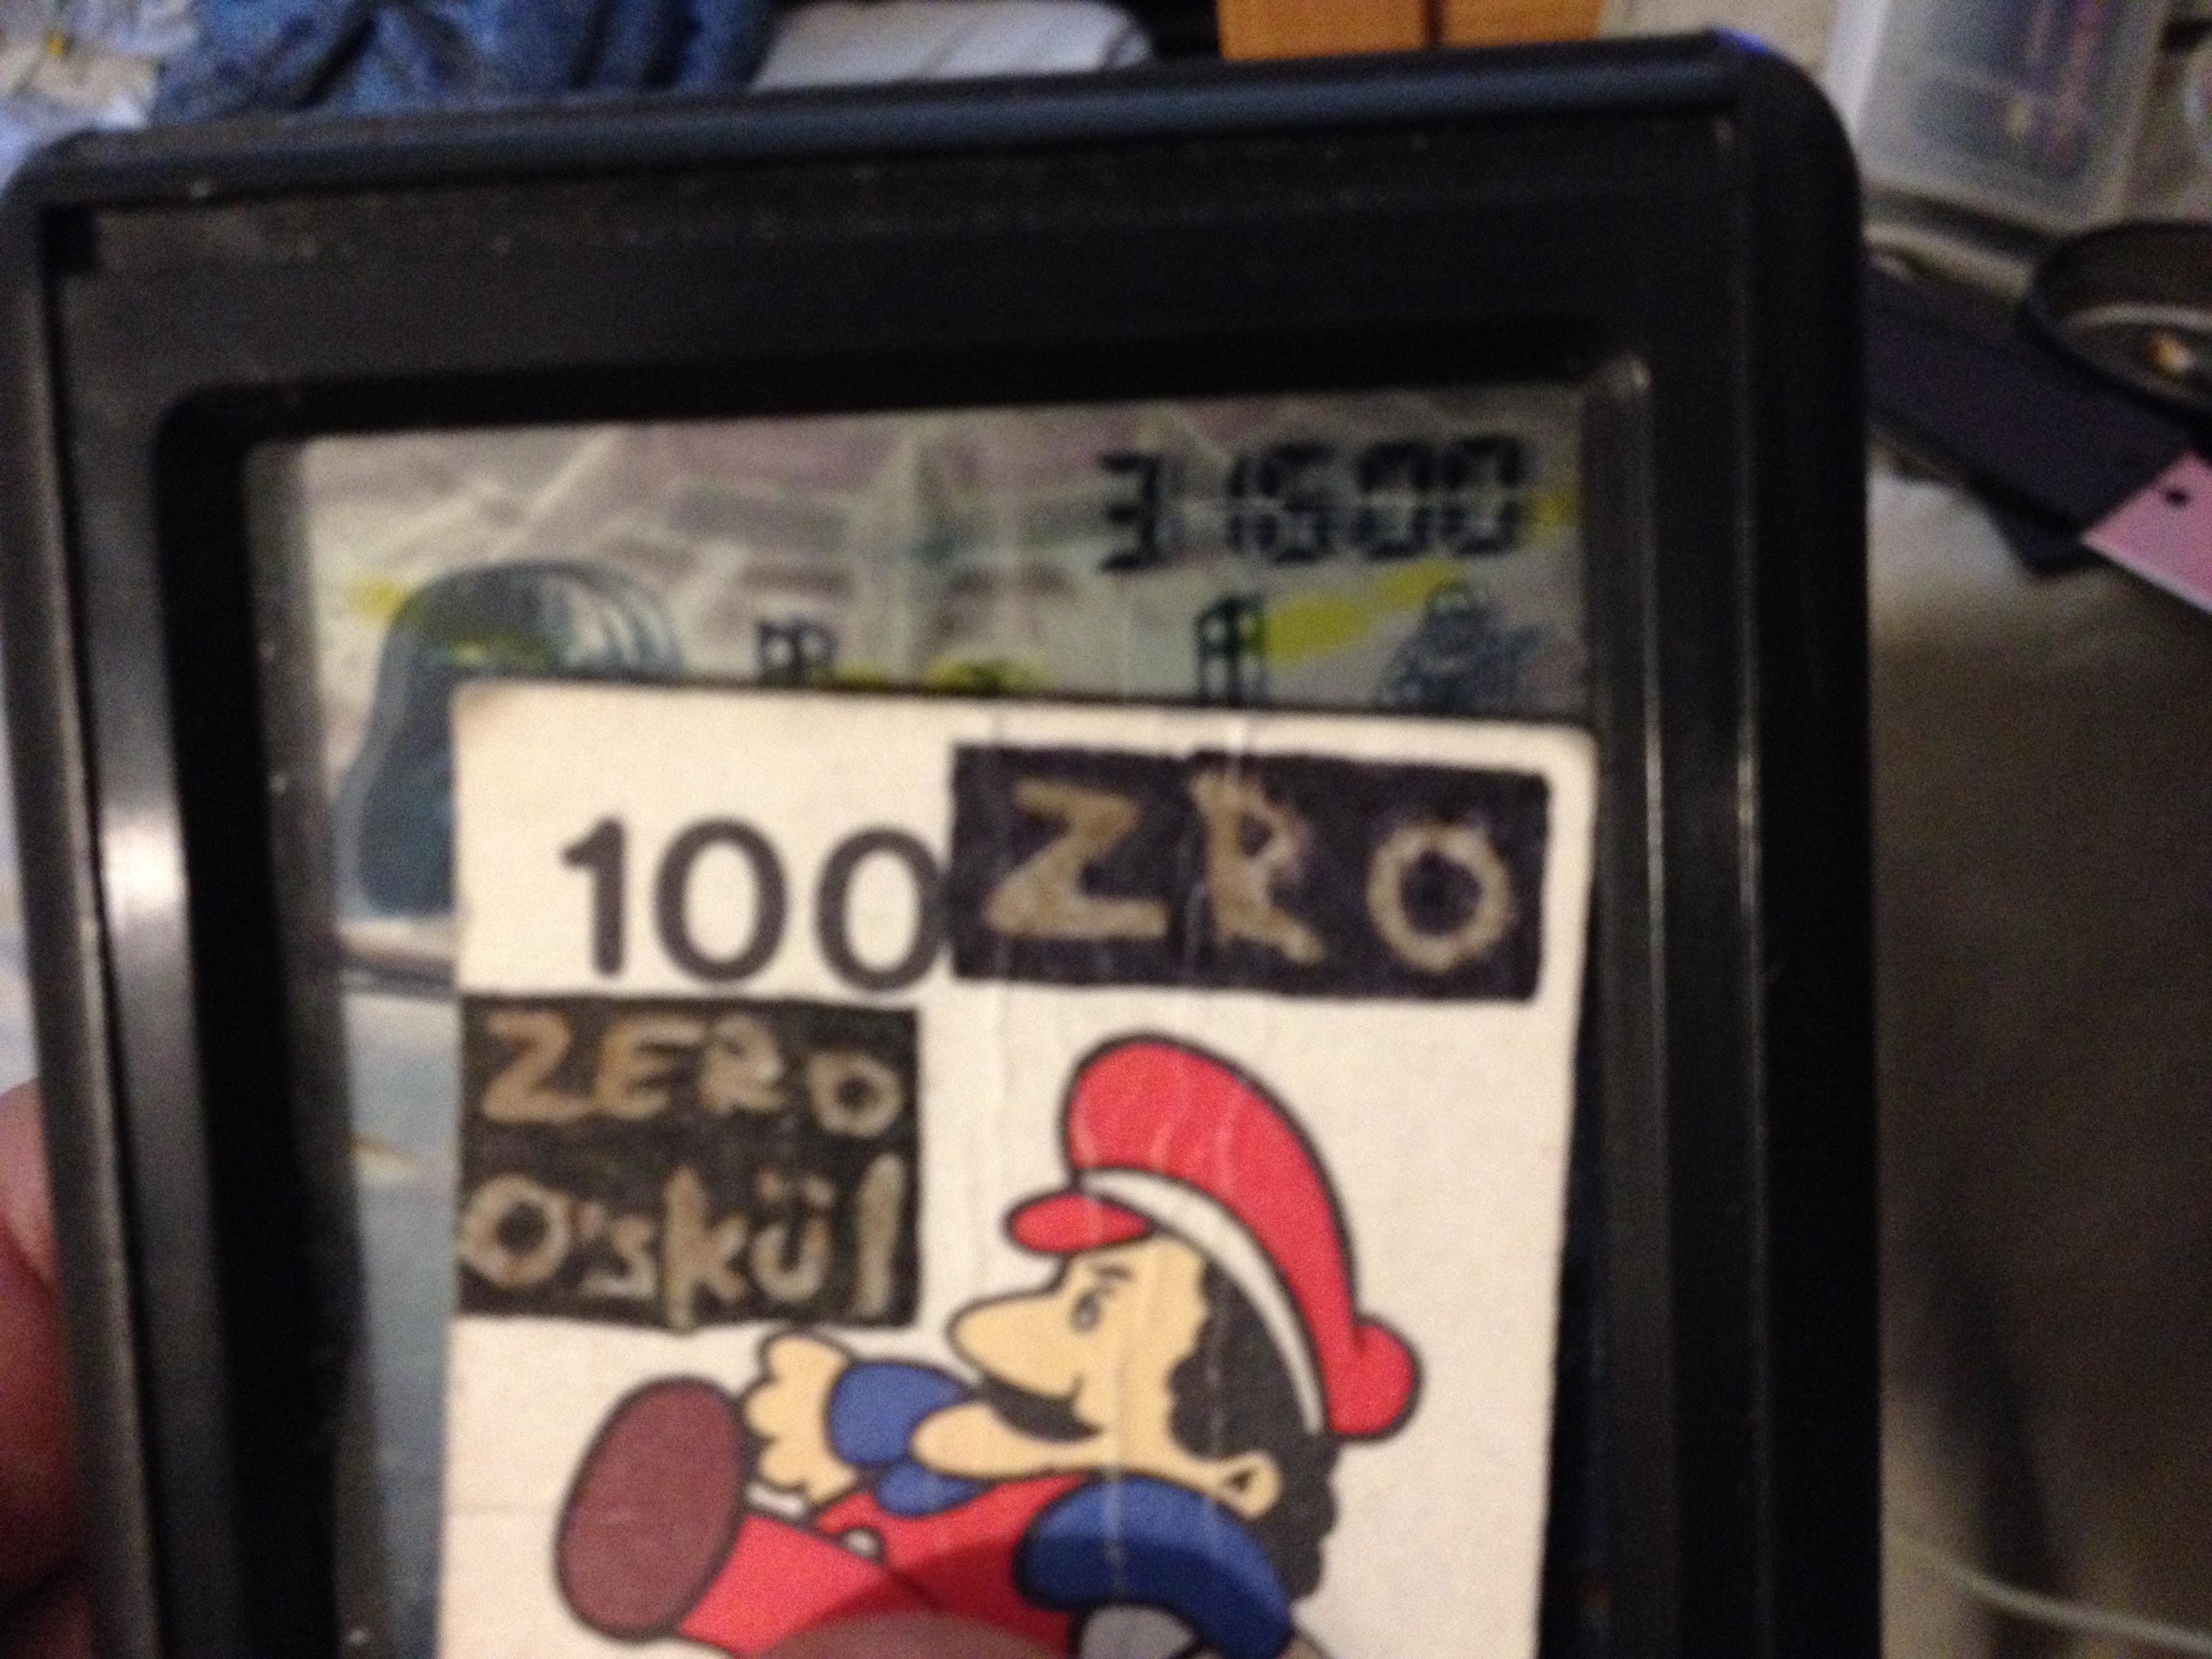 zerooskul: MGA Star Wars (Dedicated Handheld) 31,600 points on 2019-05-16 16:55:09